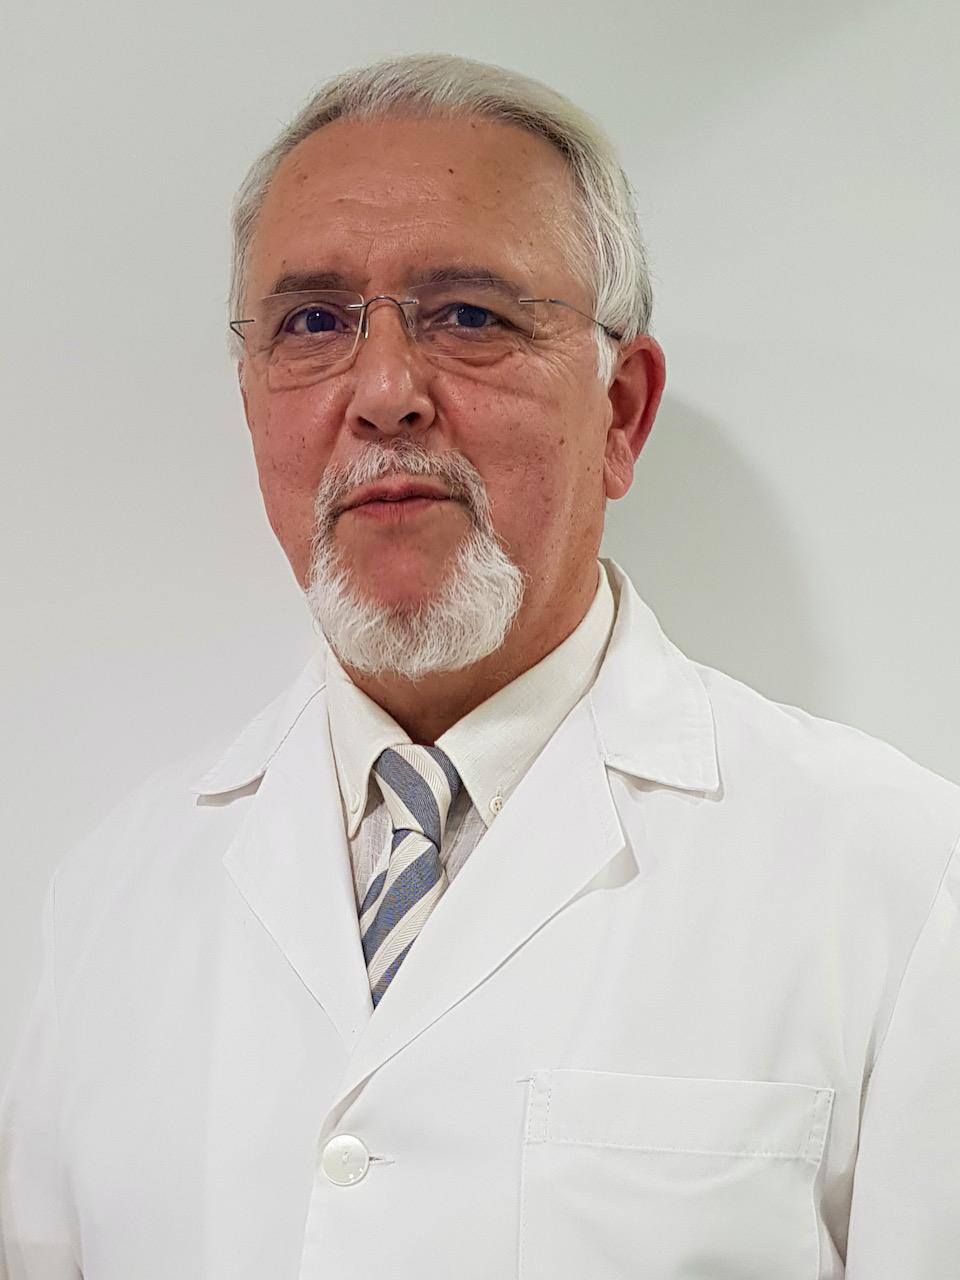 Dr. Antoni Bernat Gili